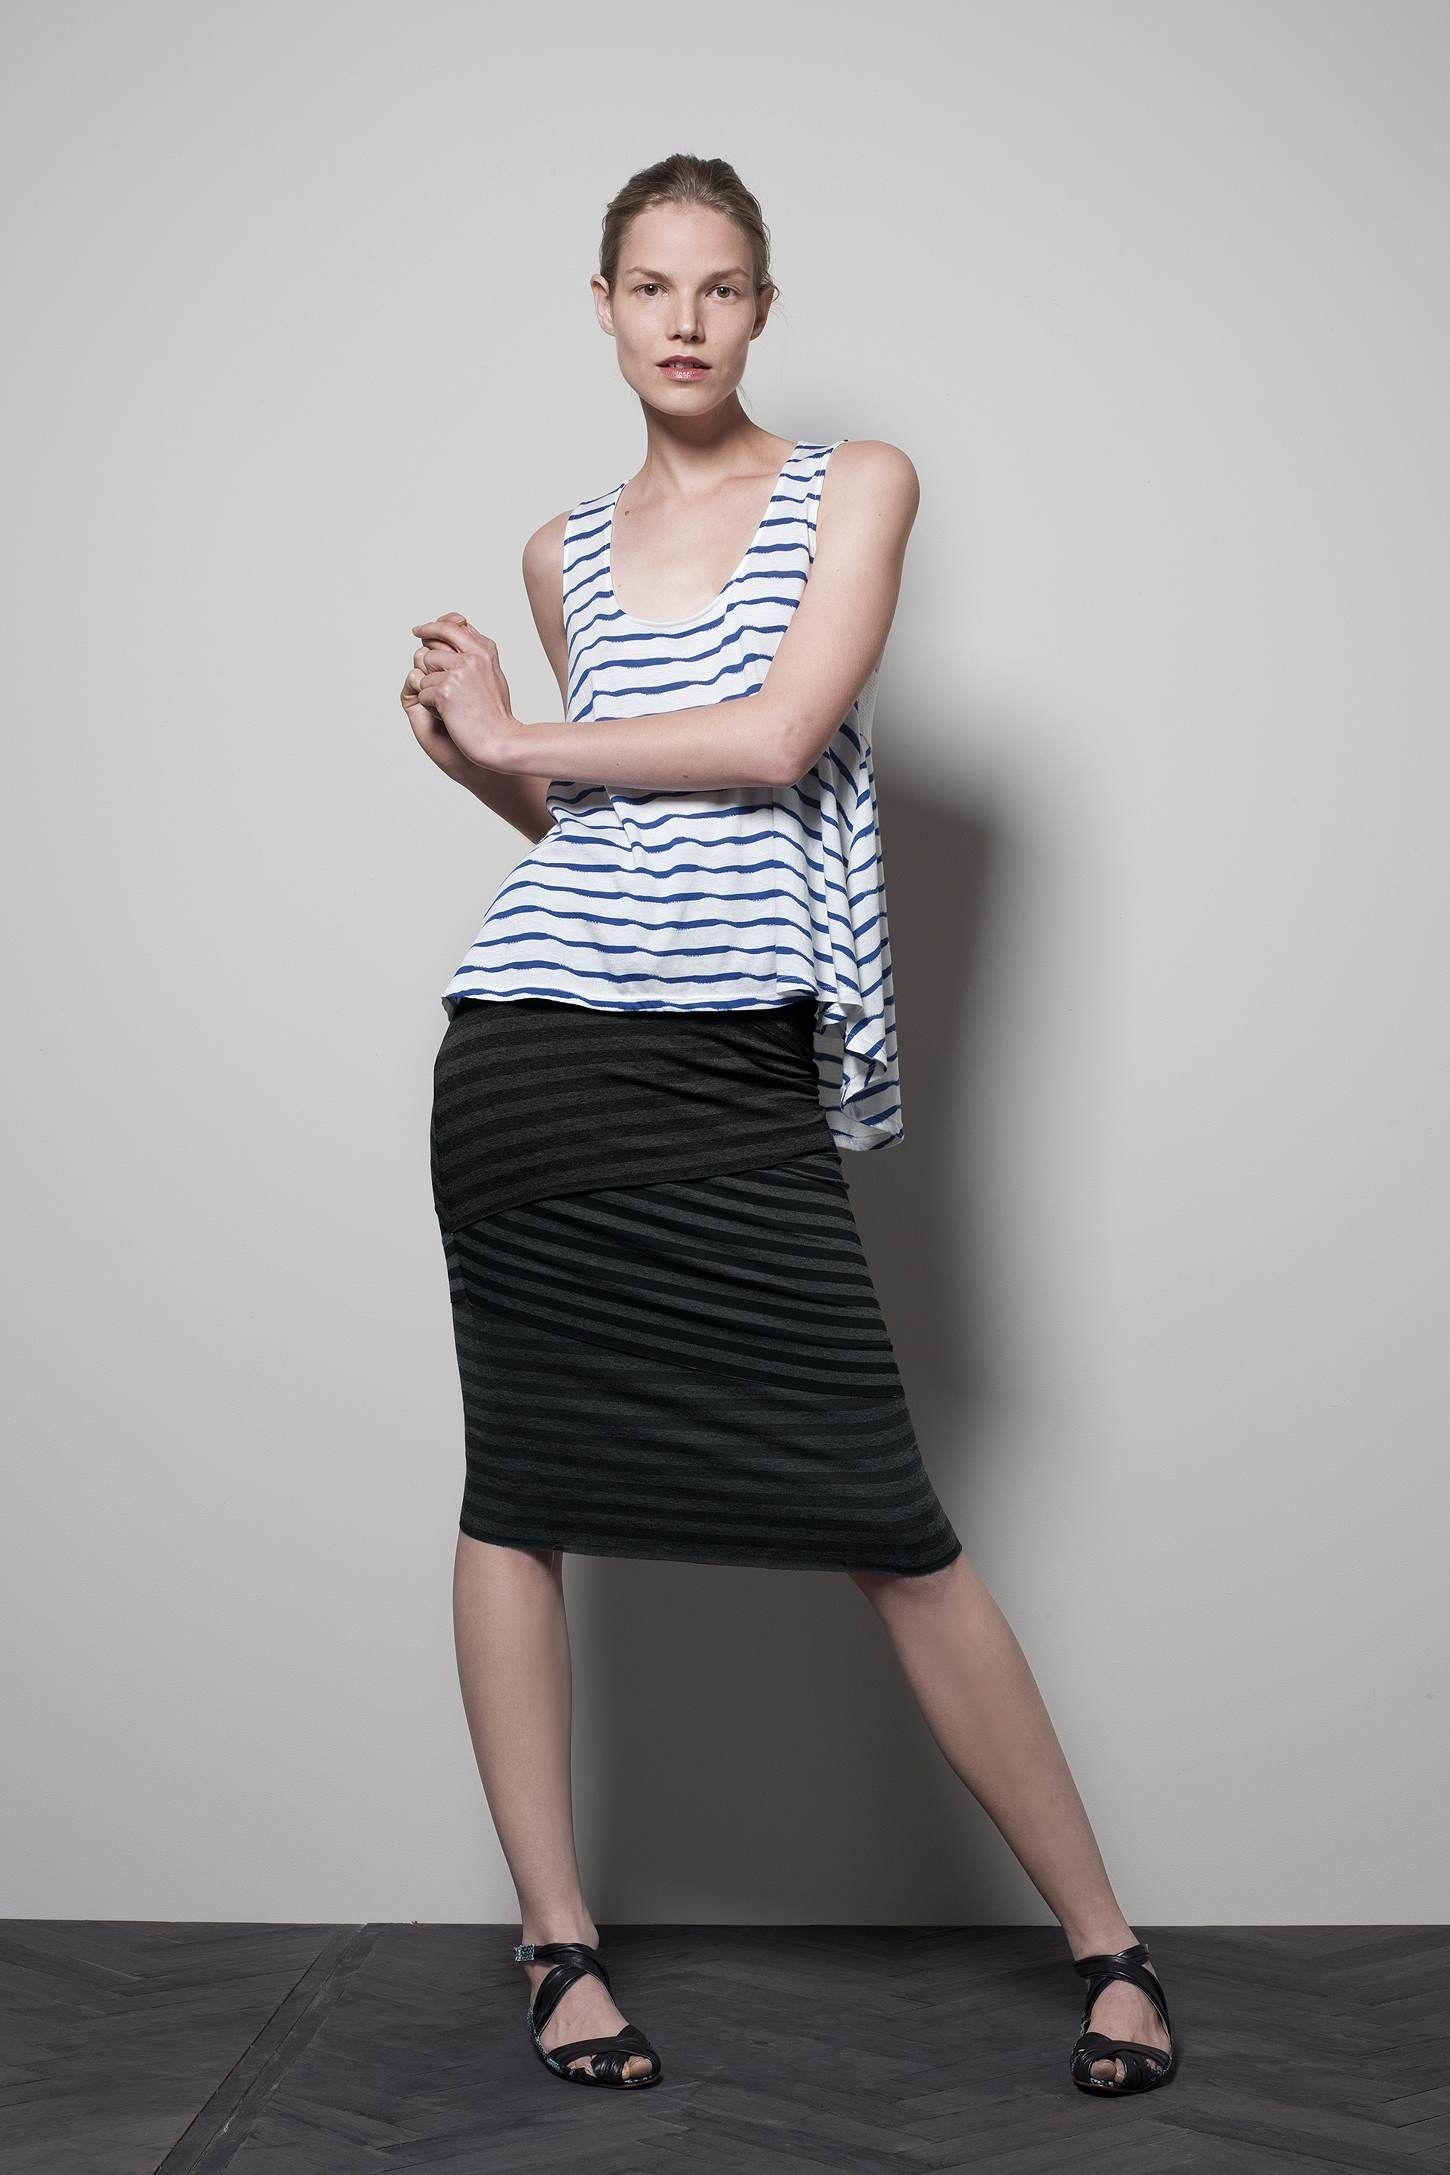 Loosened Stripes Tank- Behind The Dressing Room Door: Head To Toe In Anthro